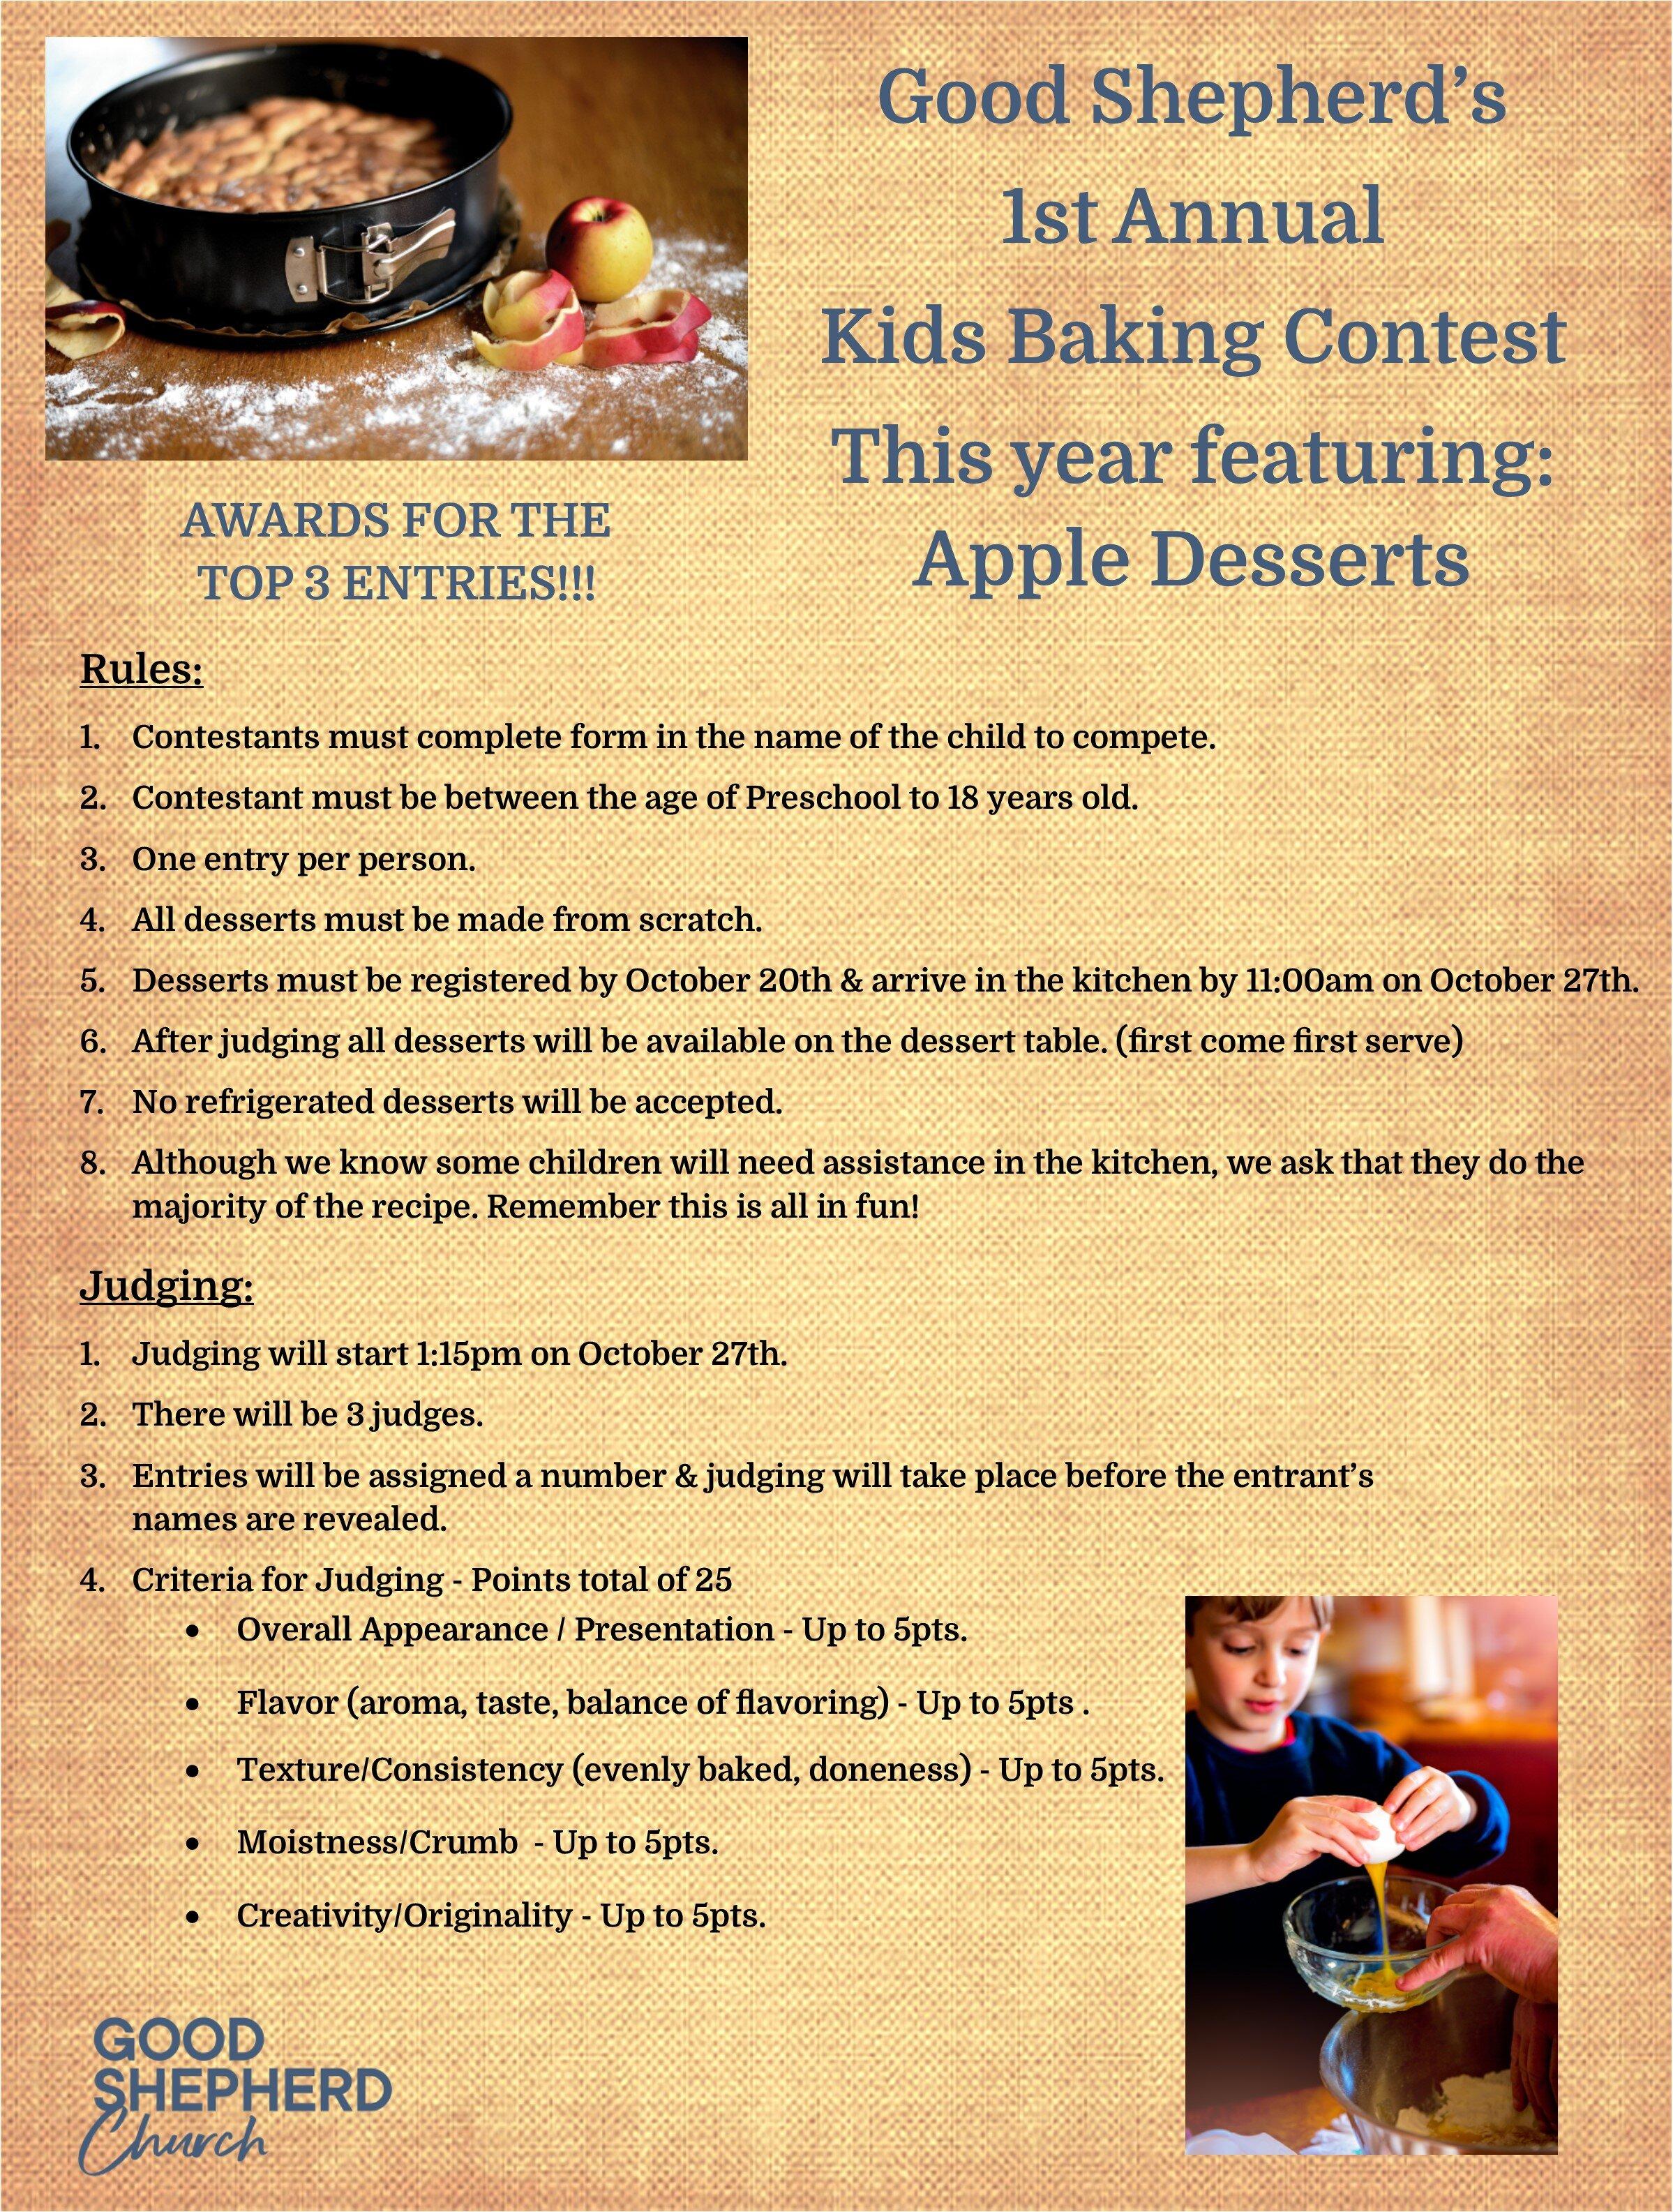 Kids baking contest pic.jpg